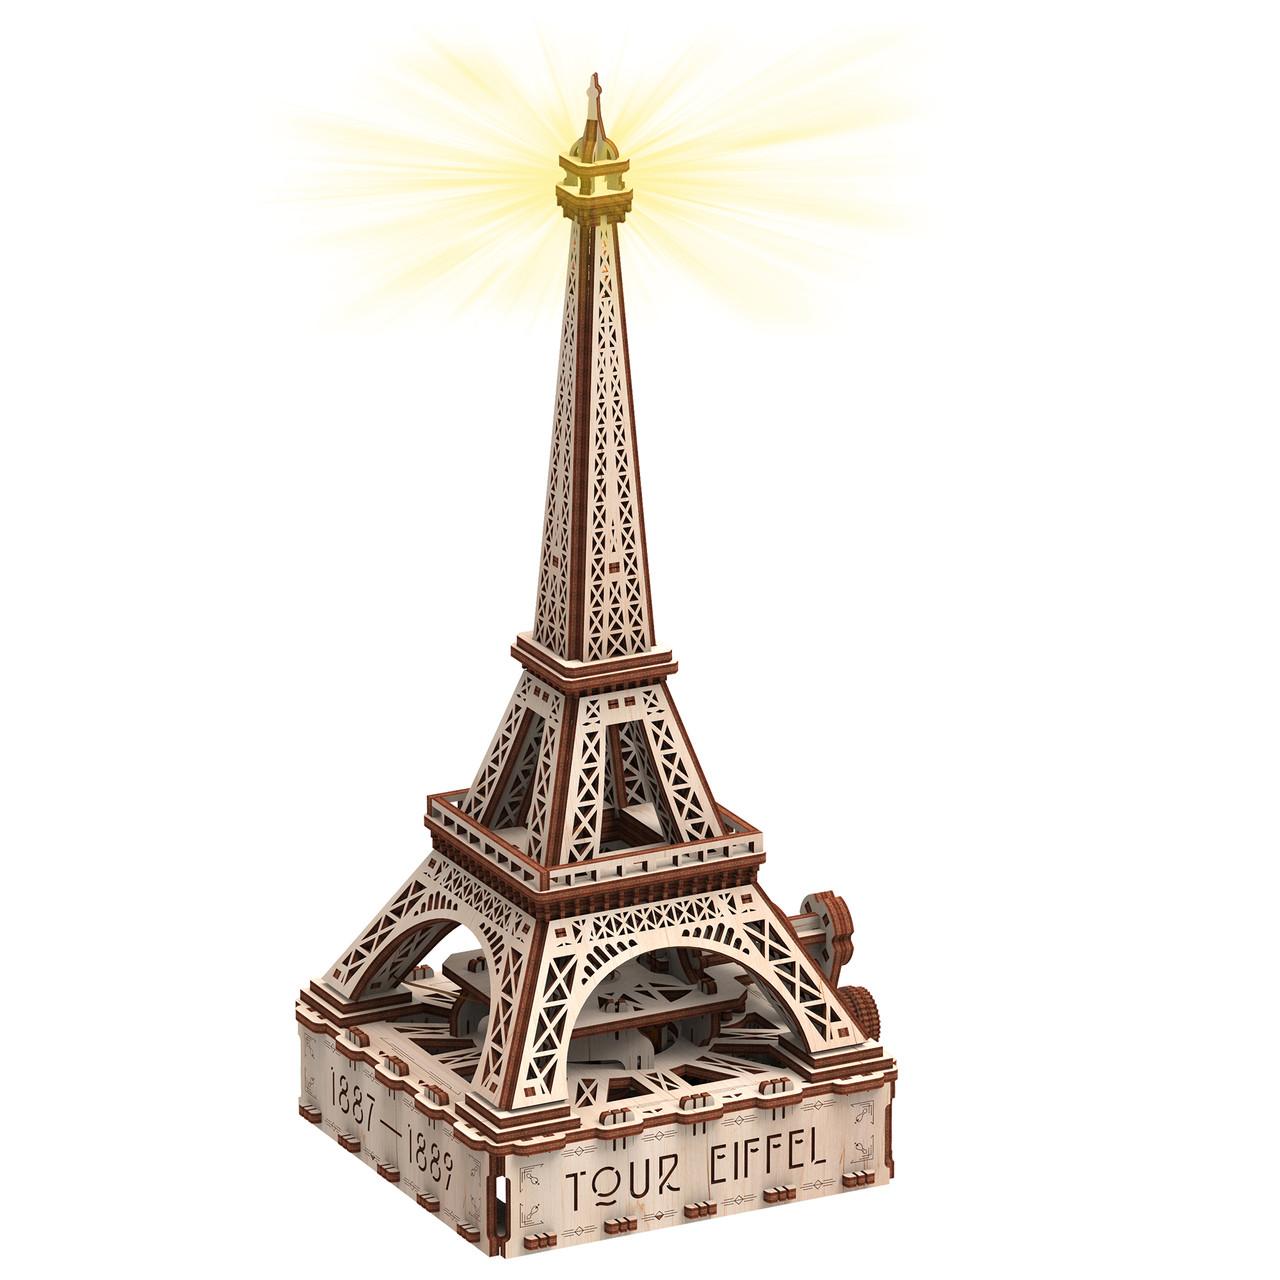 Ейфелева вежа (Еко - лайт) механічна дерев'яна 3D-модель